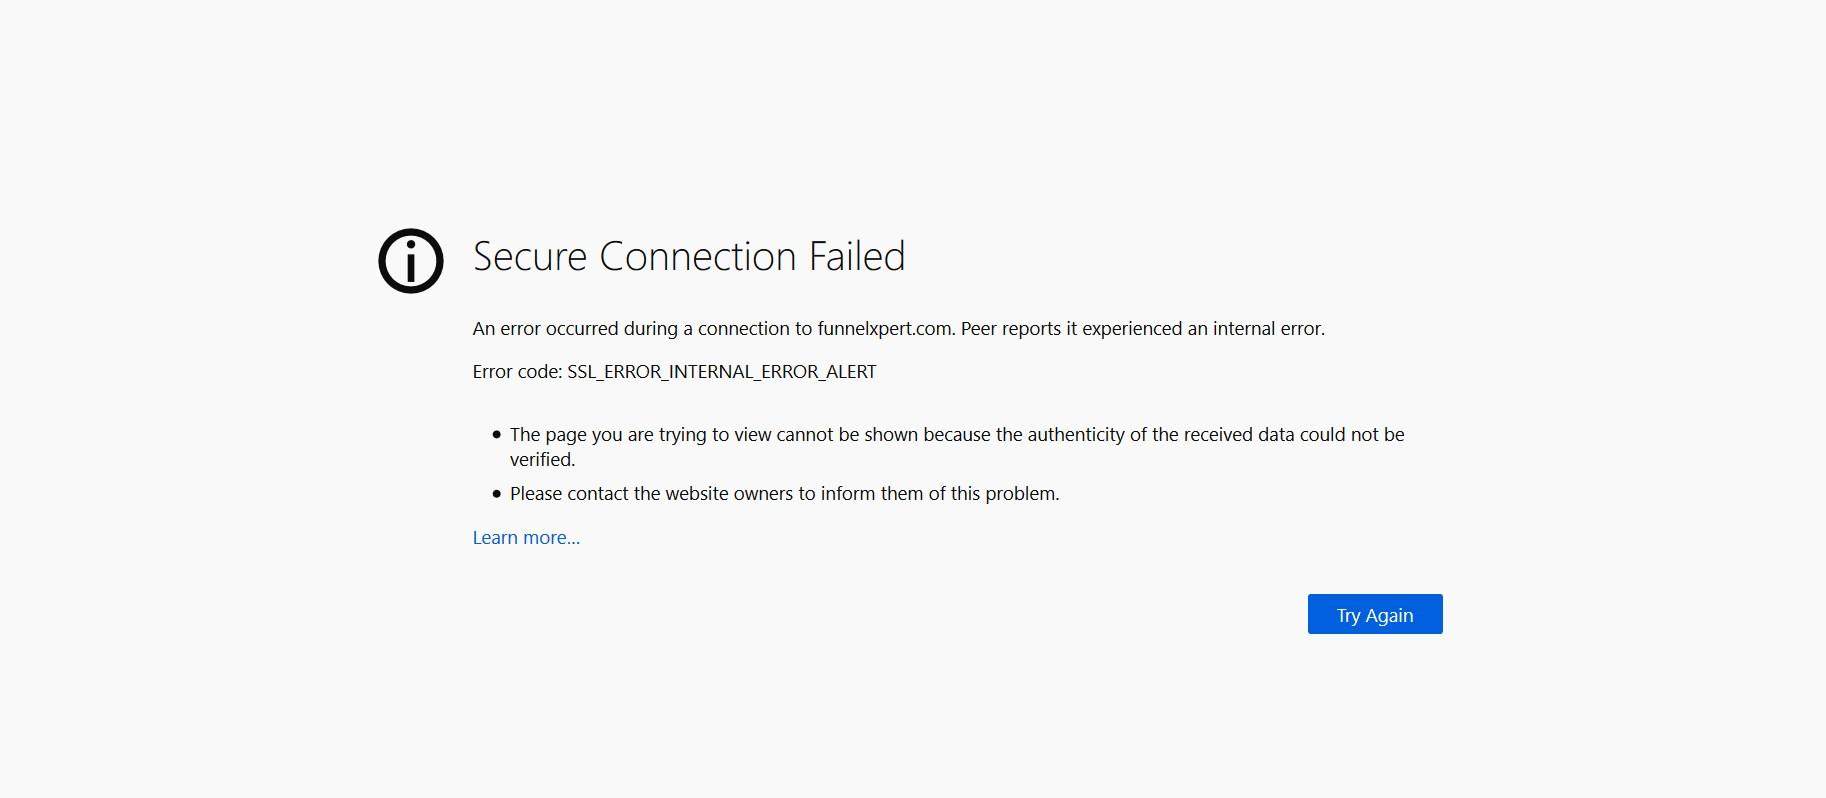 SSL_ERROR_INTERNAL_ERROR_ALERT